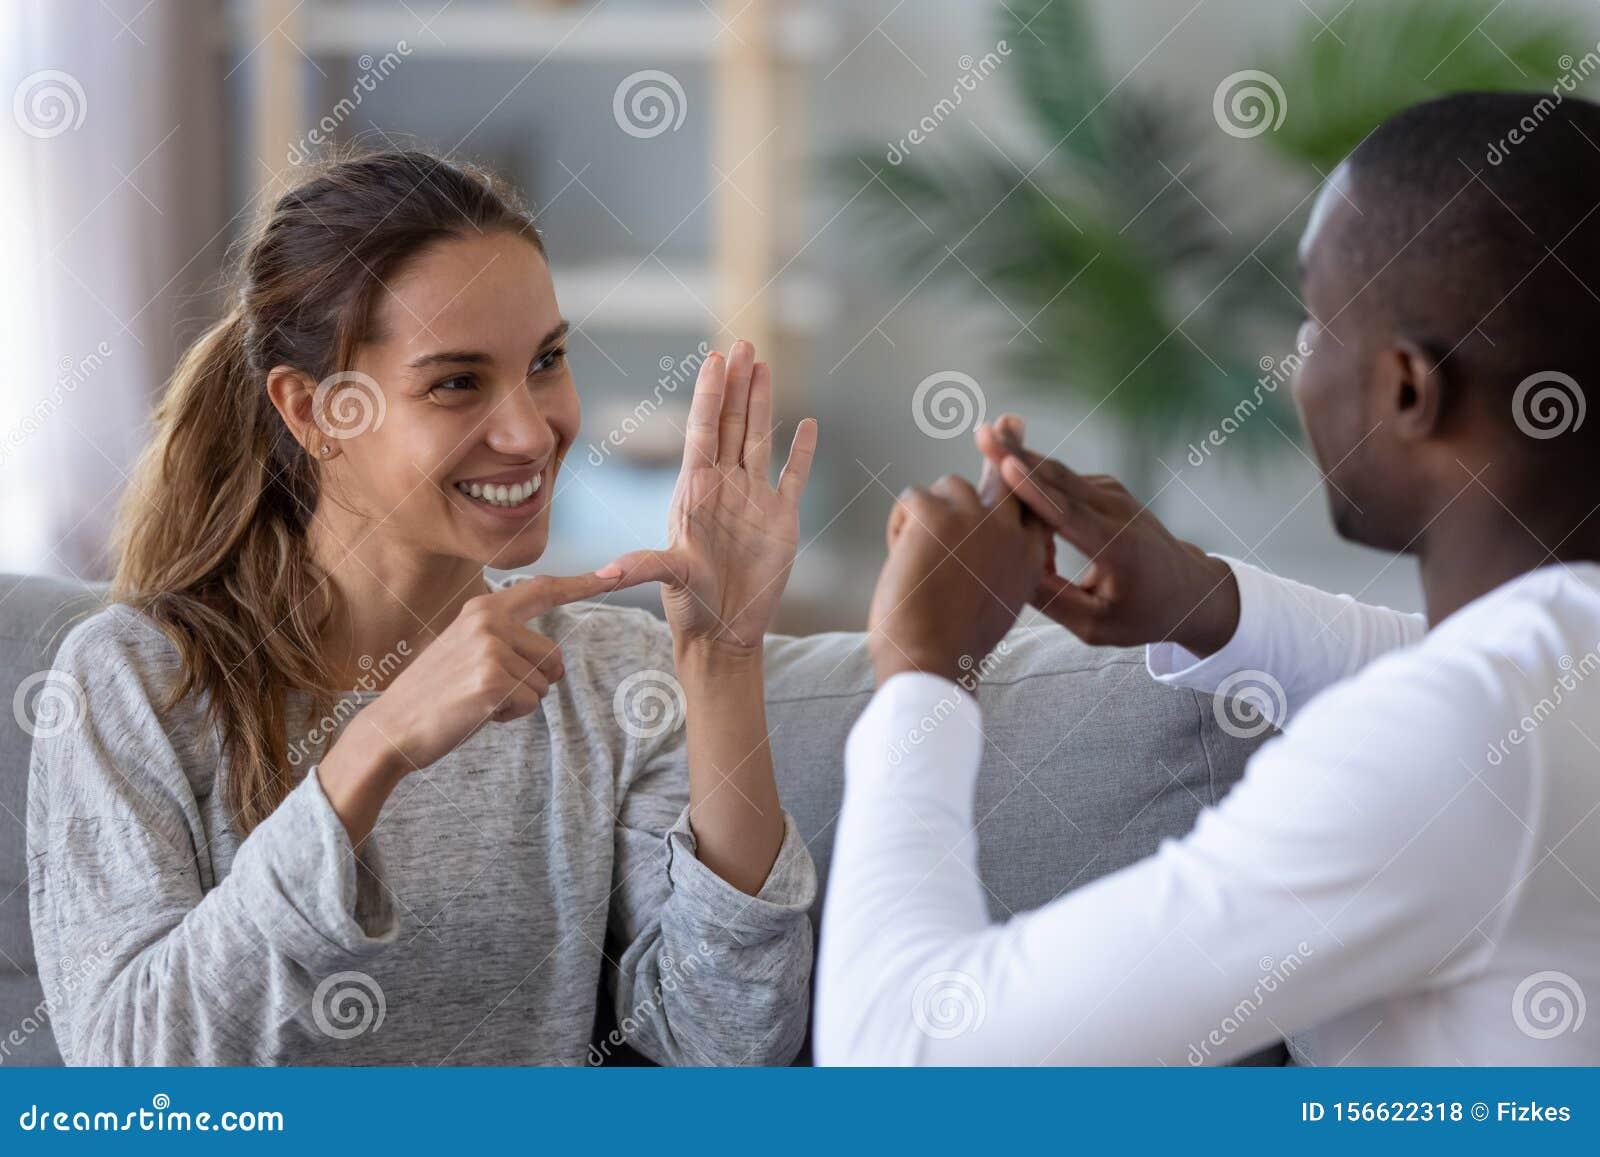 Gay dating free near haverstraw